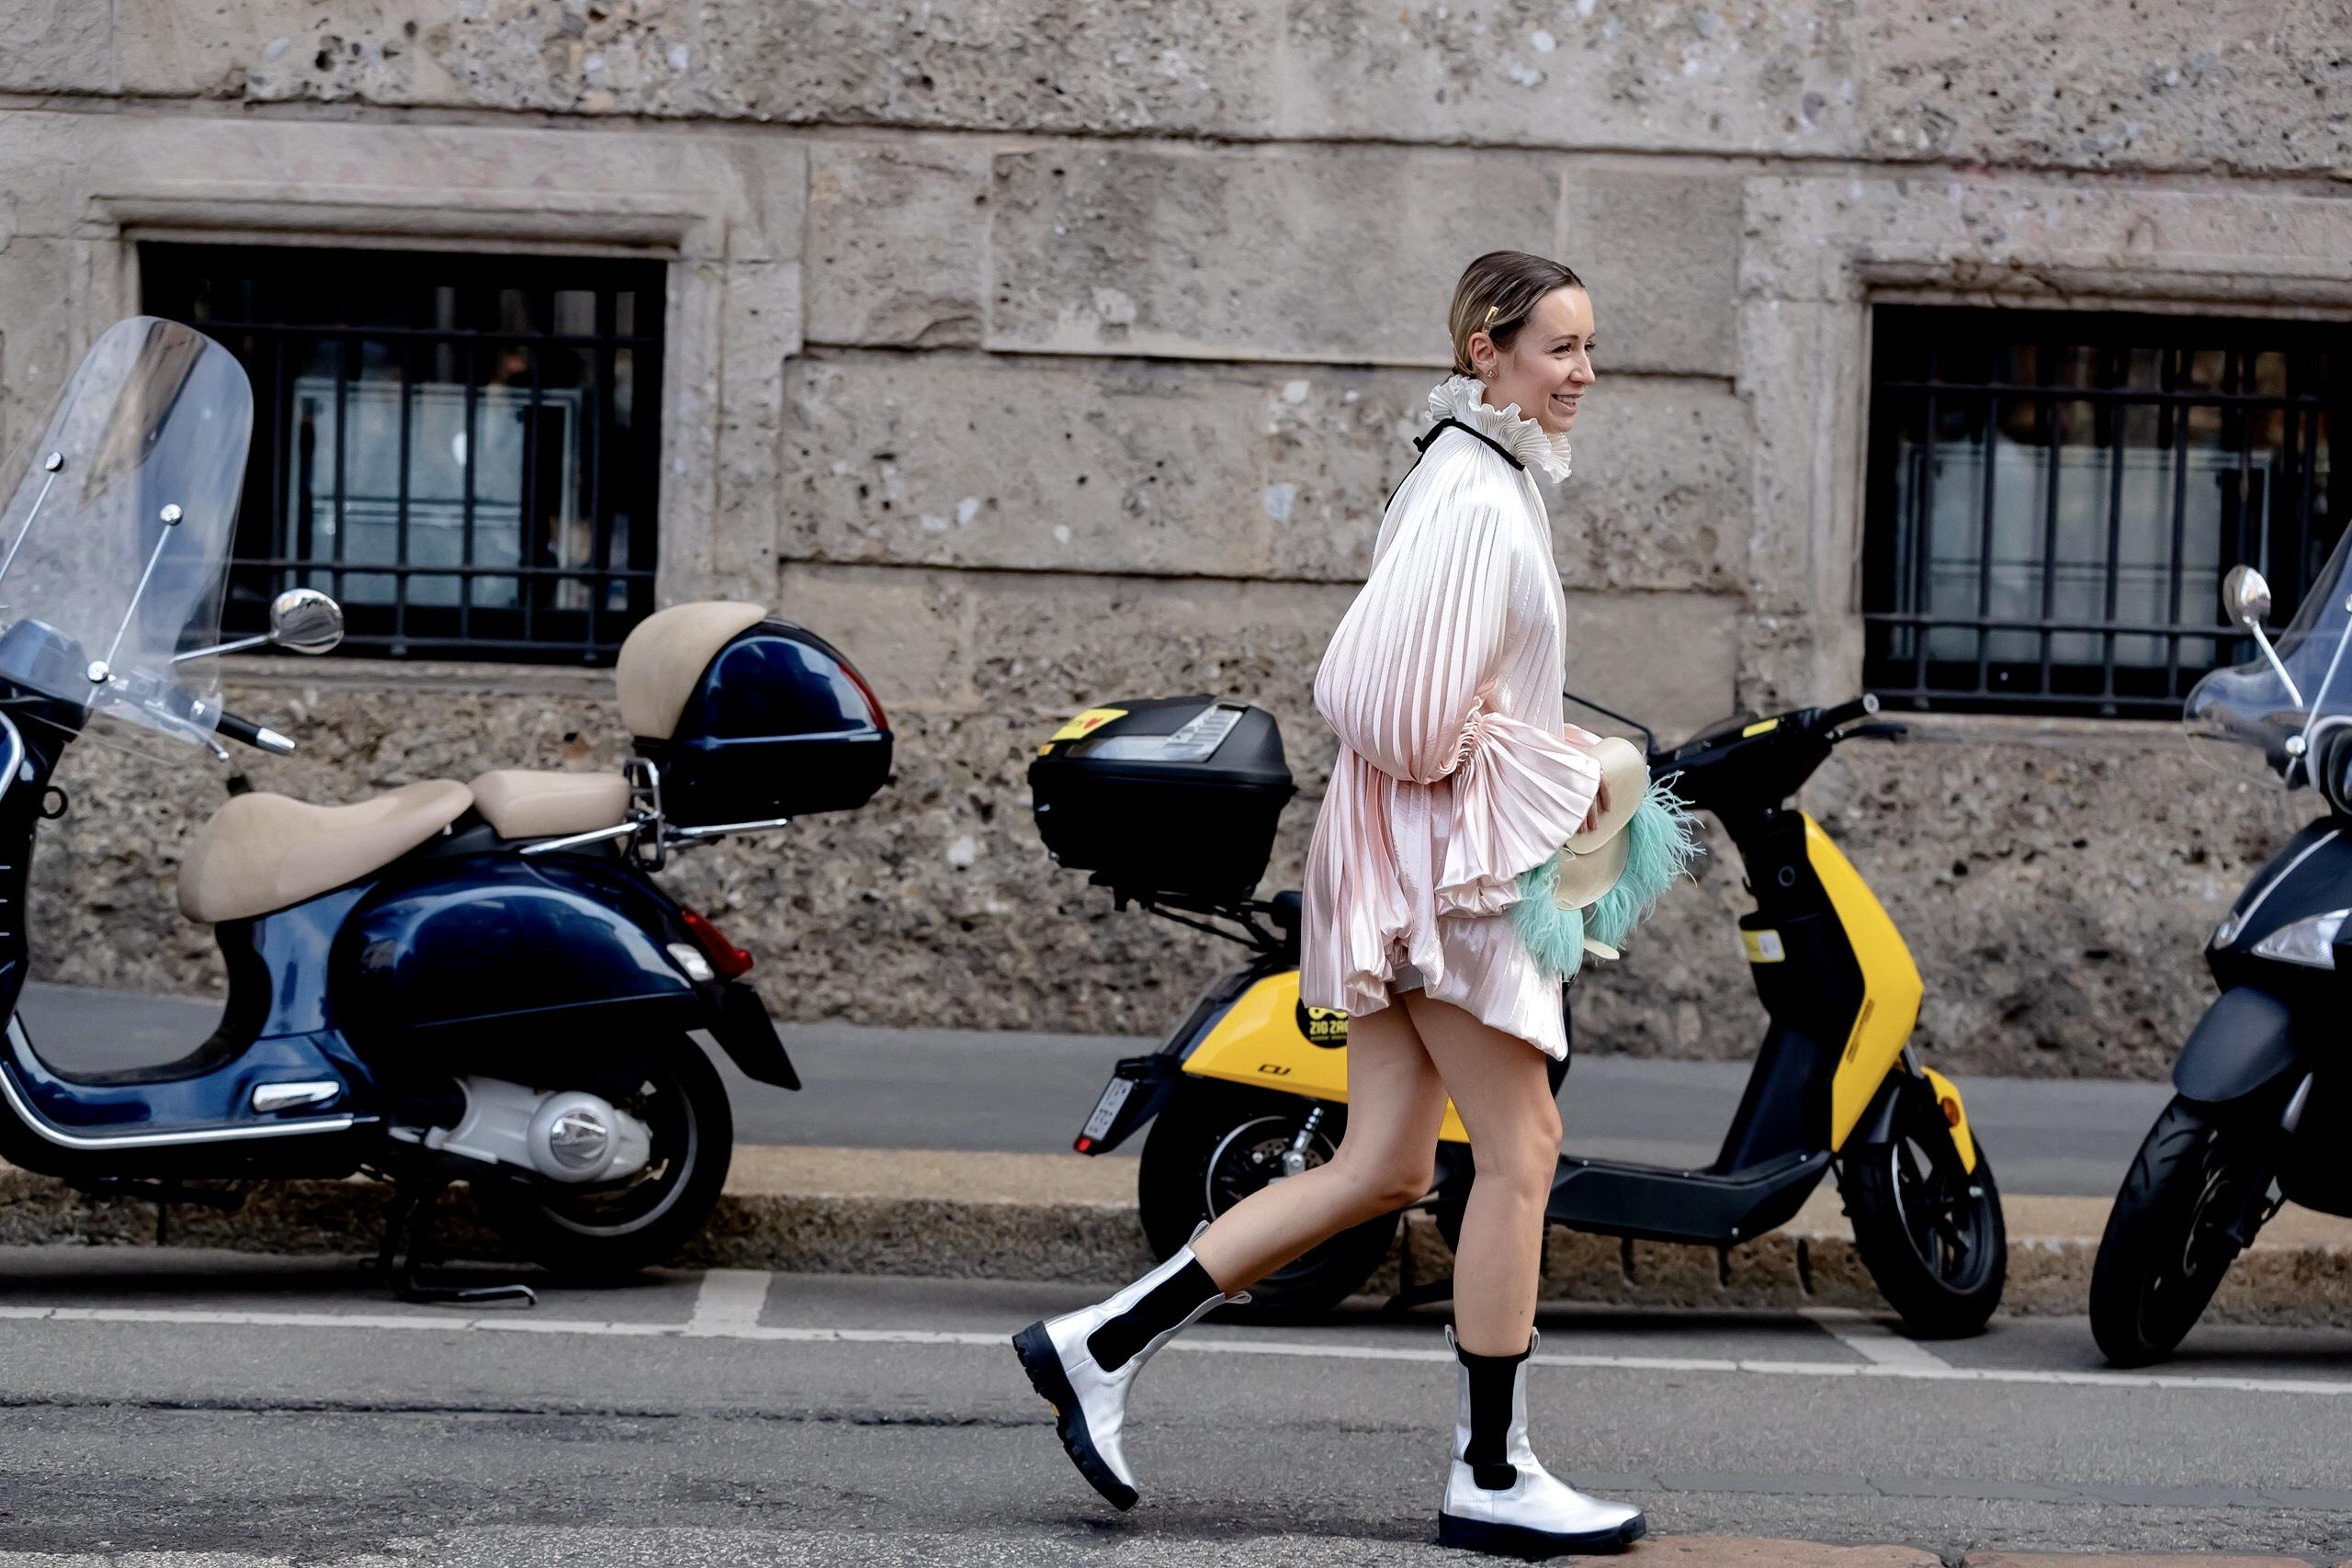 Milan Spring 2021 Day 4 Street Style by Nick Leuze Photos